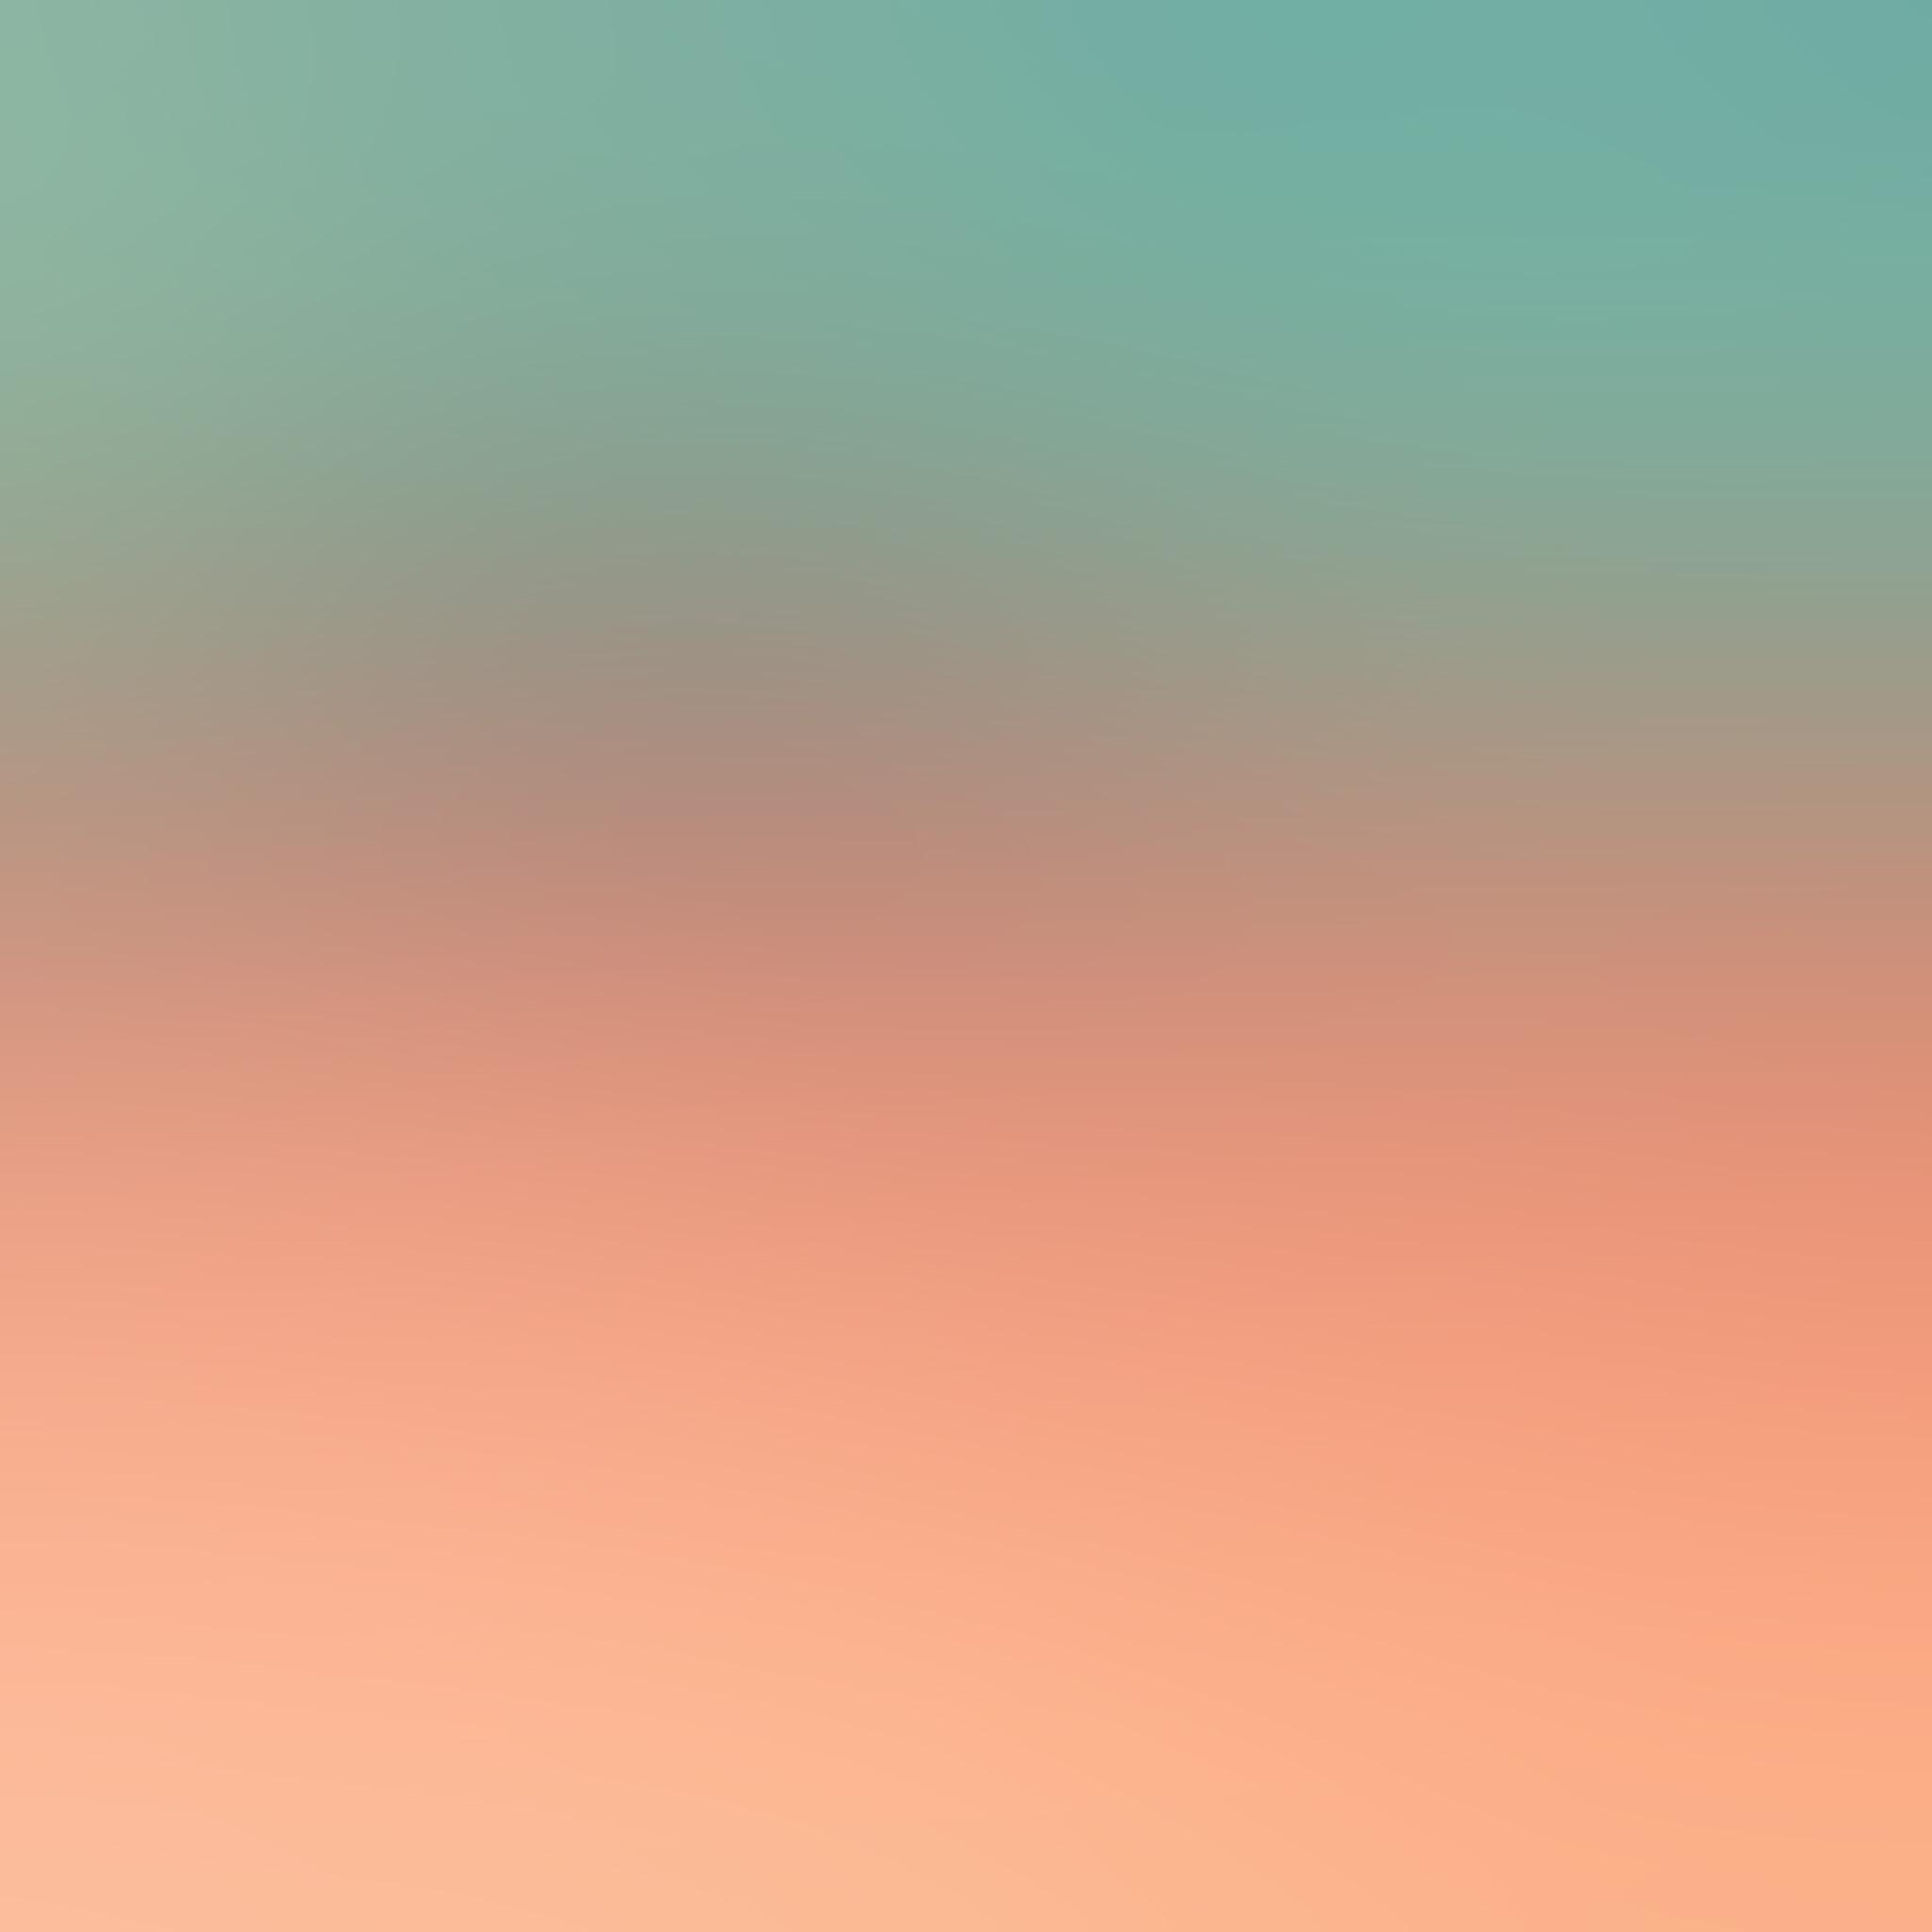 Iphone 6 Orange Flower Wallpaper I Love Papers Si52 Green Orange Soft Pastel Gradation Blur